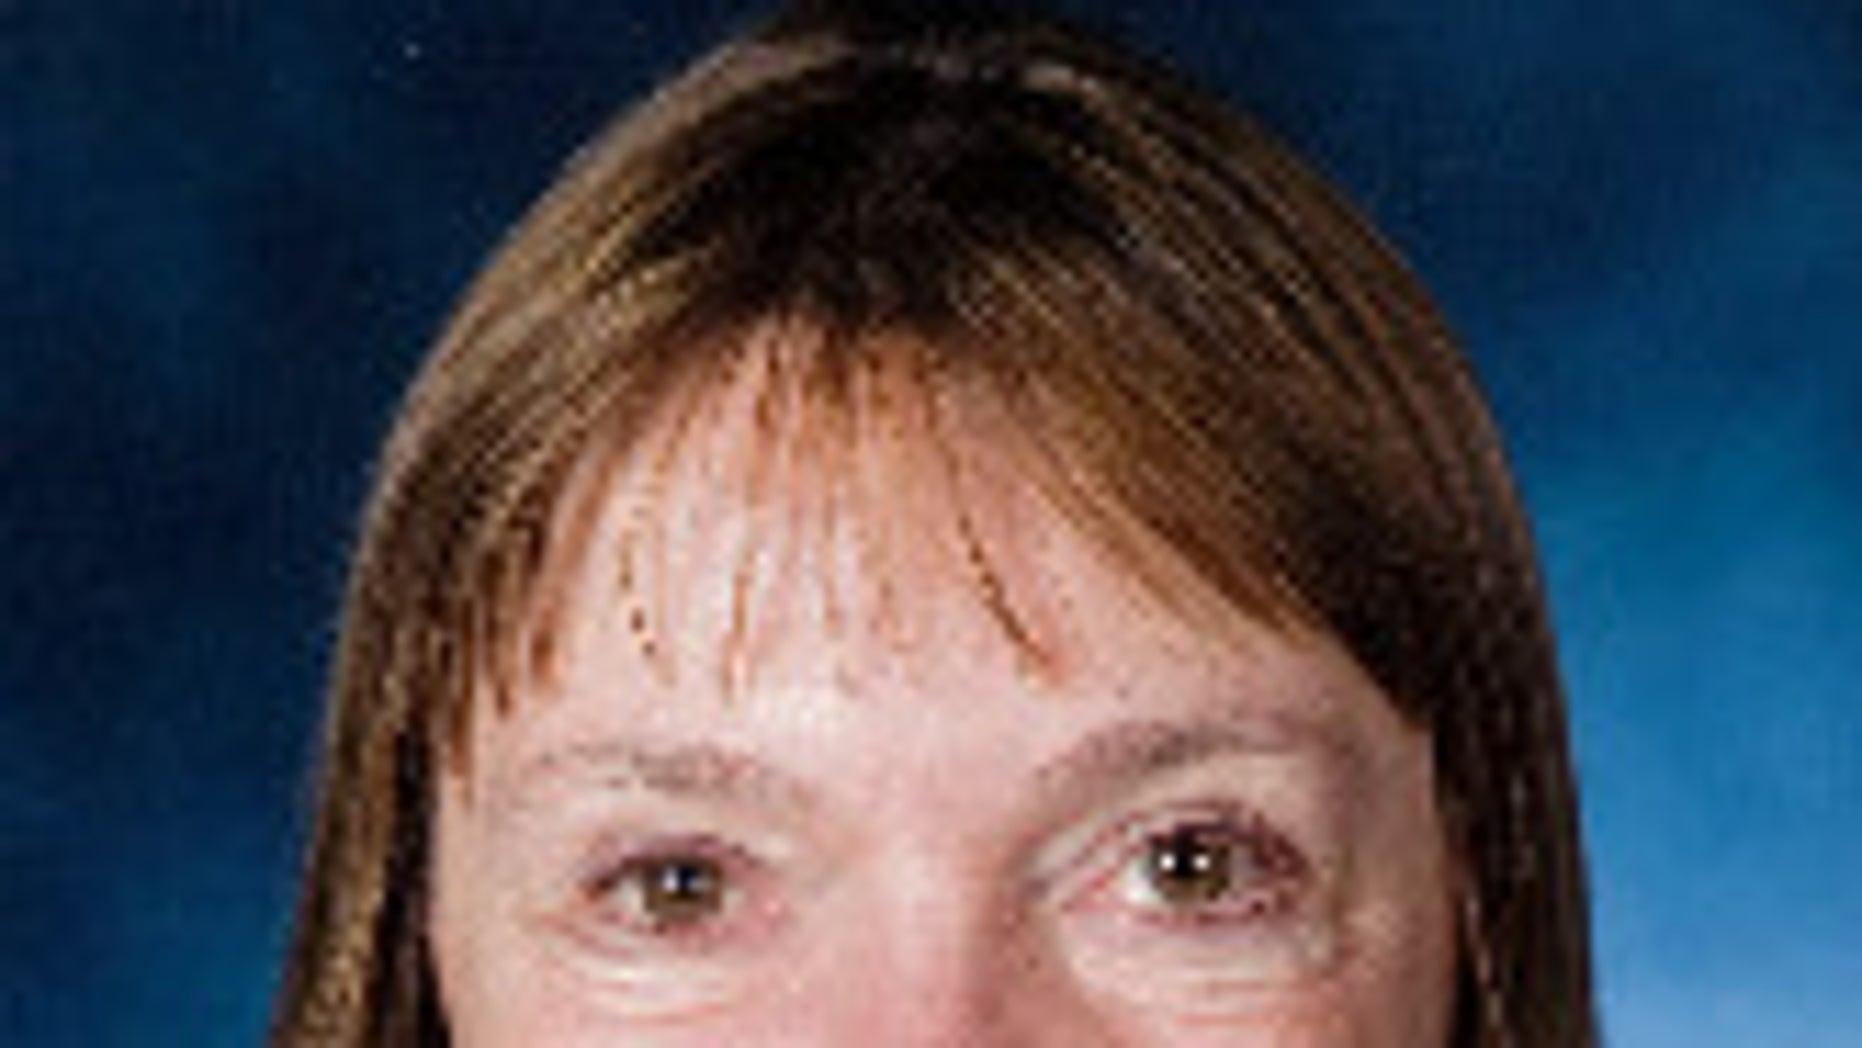 Prof. Susan Douglas, University of Michigan